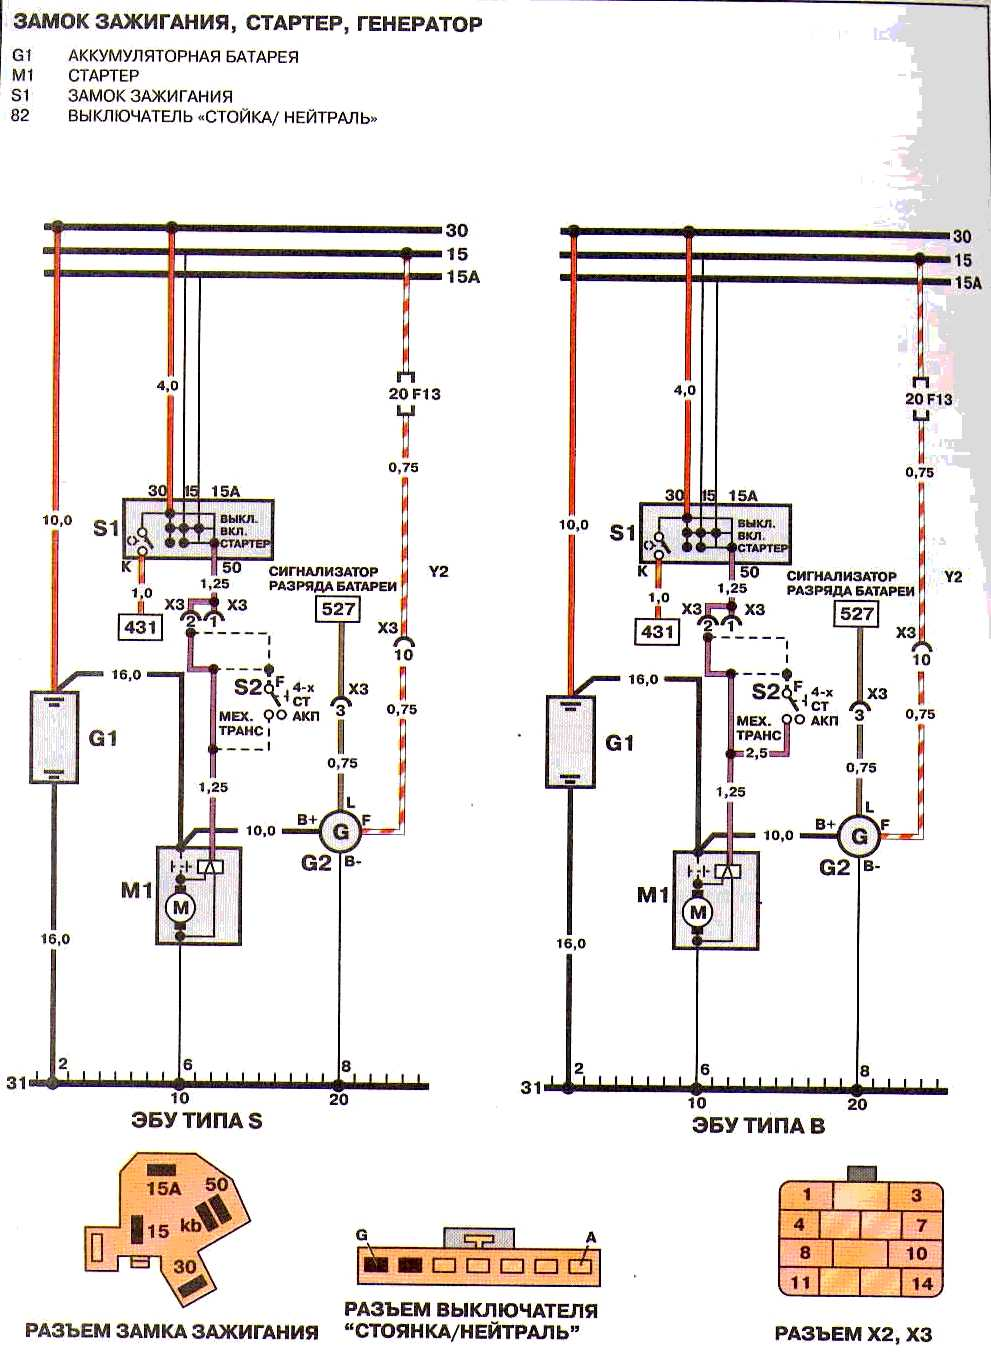 "G1 Аккумуляторная батарея М1 Стартер S1 Замок зажигания 82 Выключатель  ""Стоянка/нейтраль "" .  21.6.3 Система зажигания..."